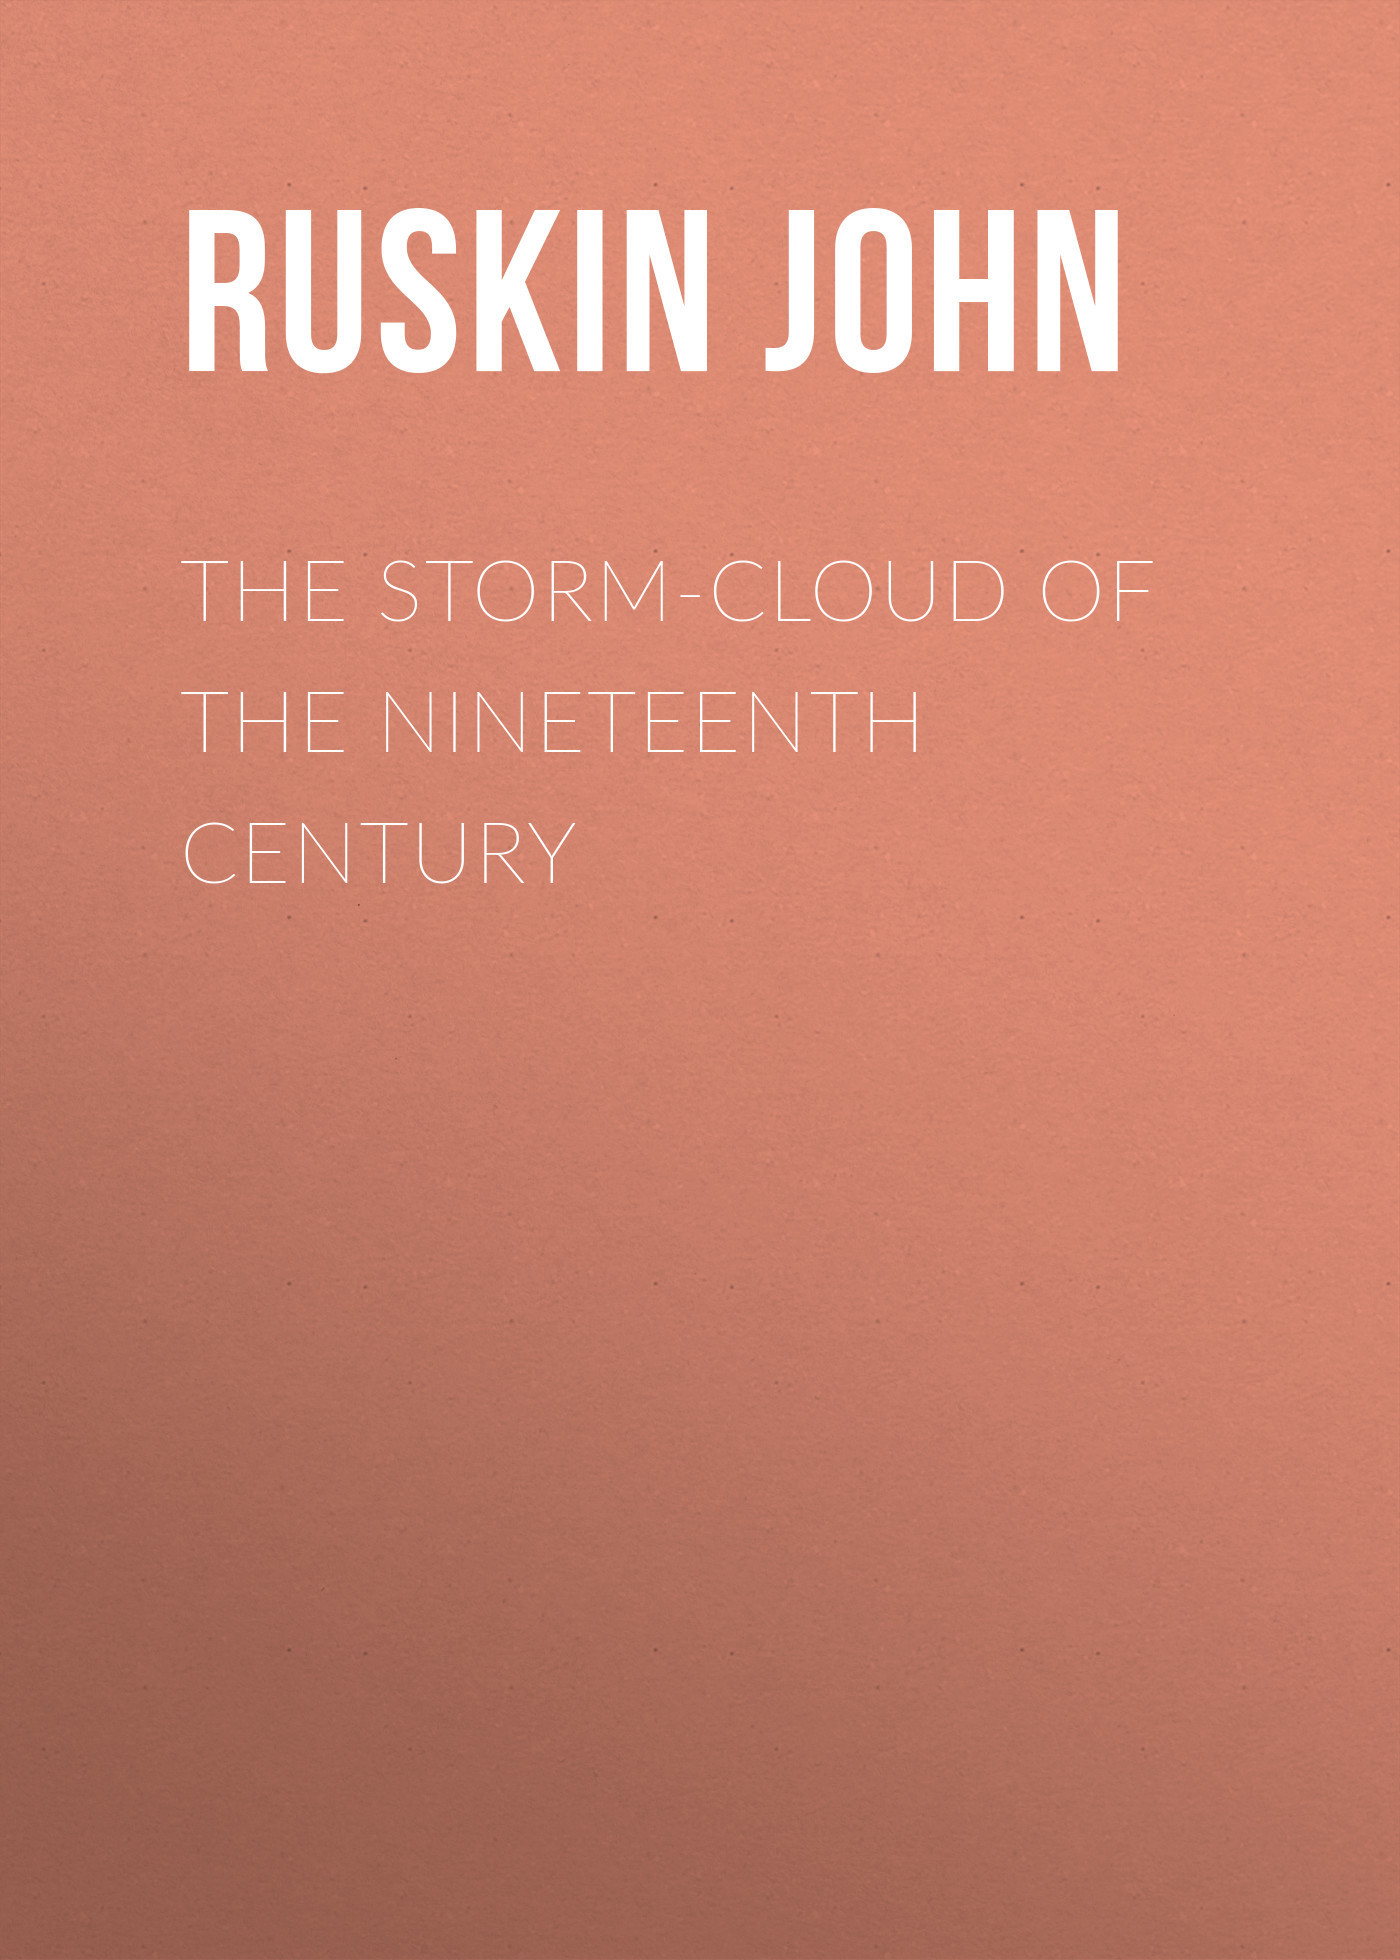 Ruskin John The Storm-Cloud of the Nineteenth Century